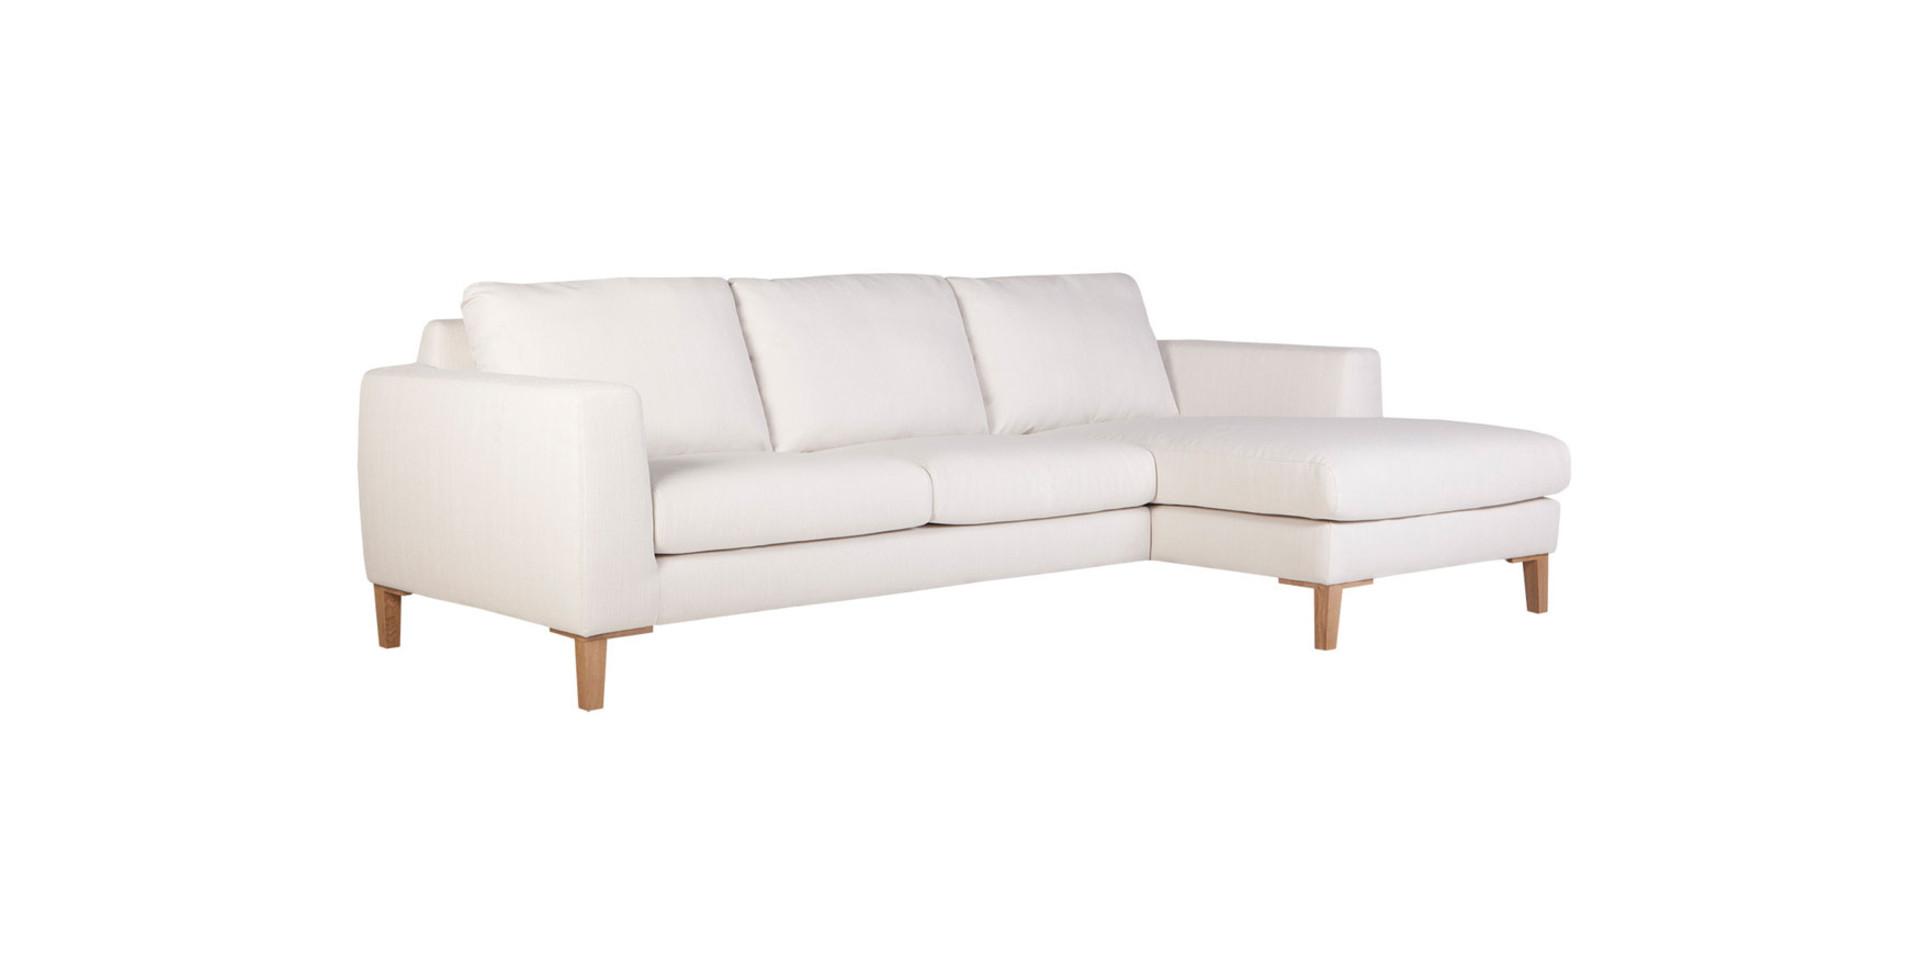 sits-malin-angle-set1_cedros1_white_2